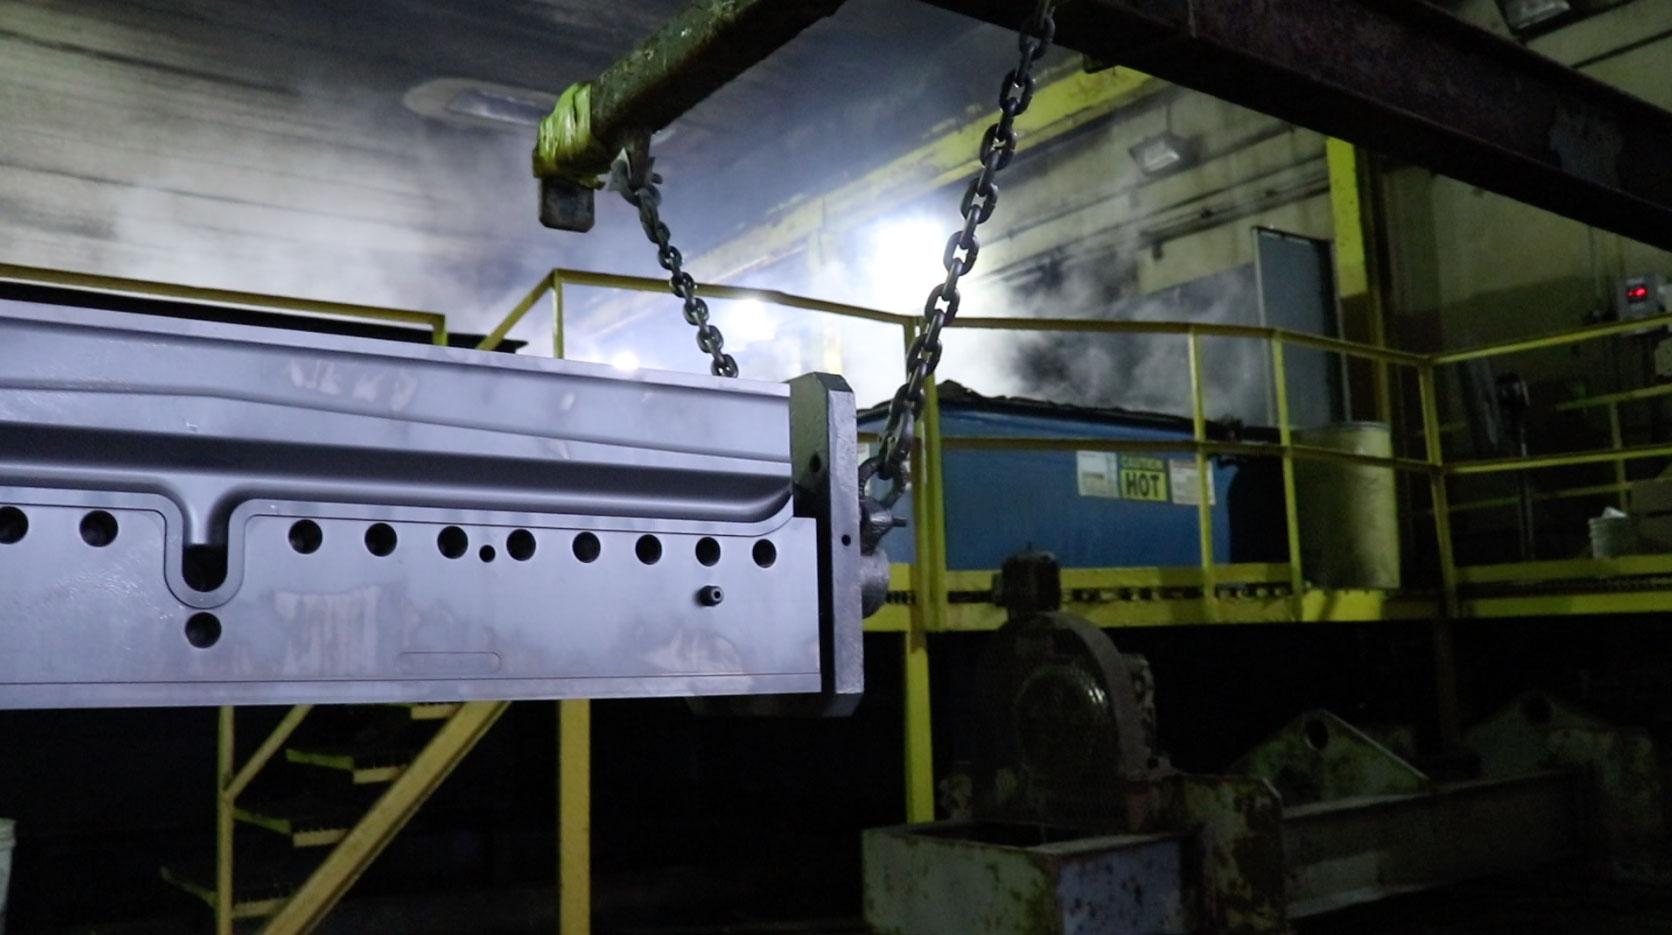 Nye-Tef™ - Electroless Nickel PTFE Coatings | Electro-Coating